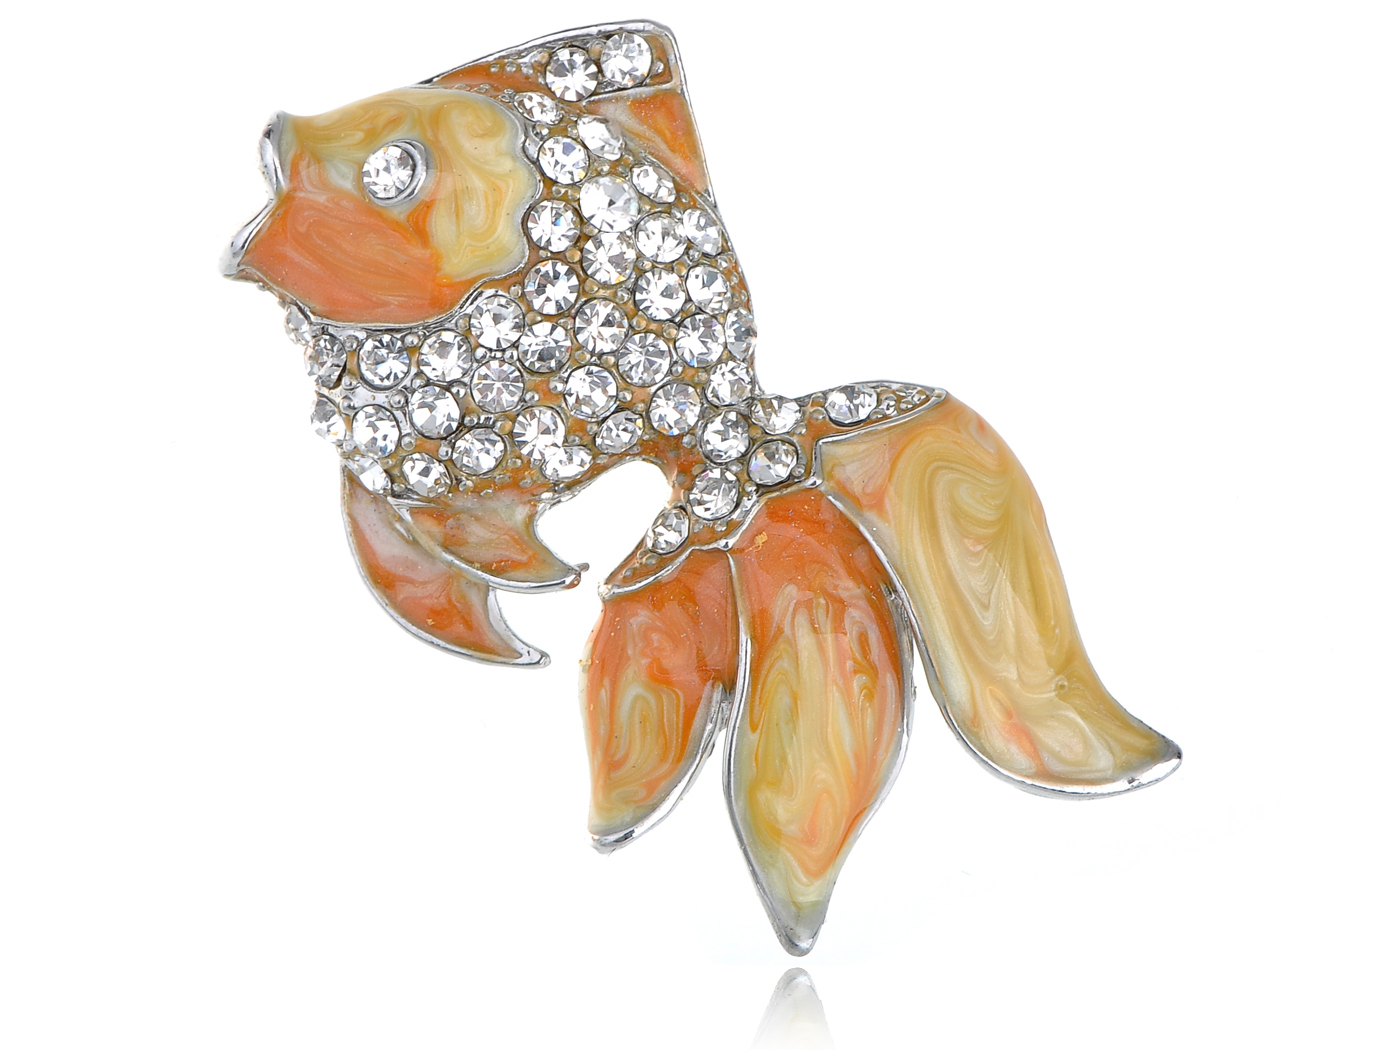 Lovely Yellow Goldenfish Orange Enamel Crystal Rhinestone Sea Creature Pin Brooch by